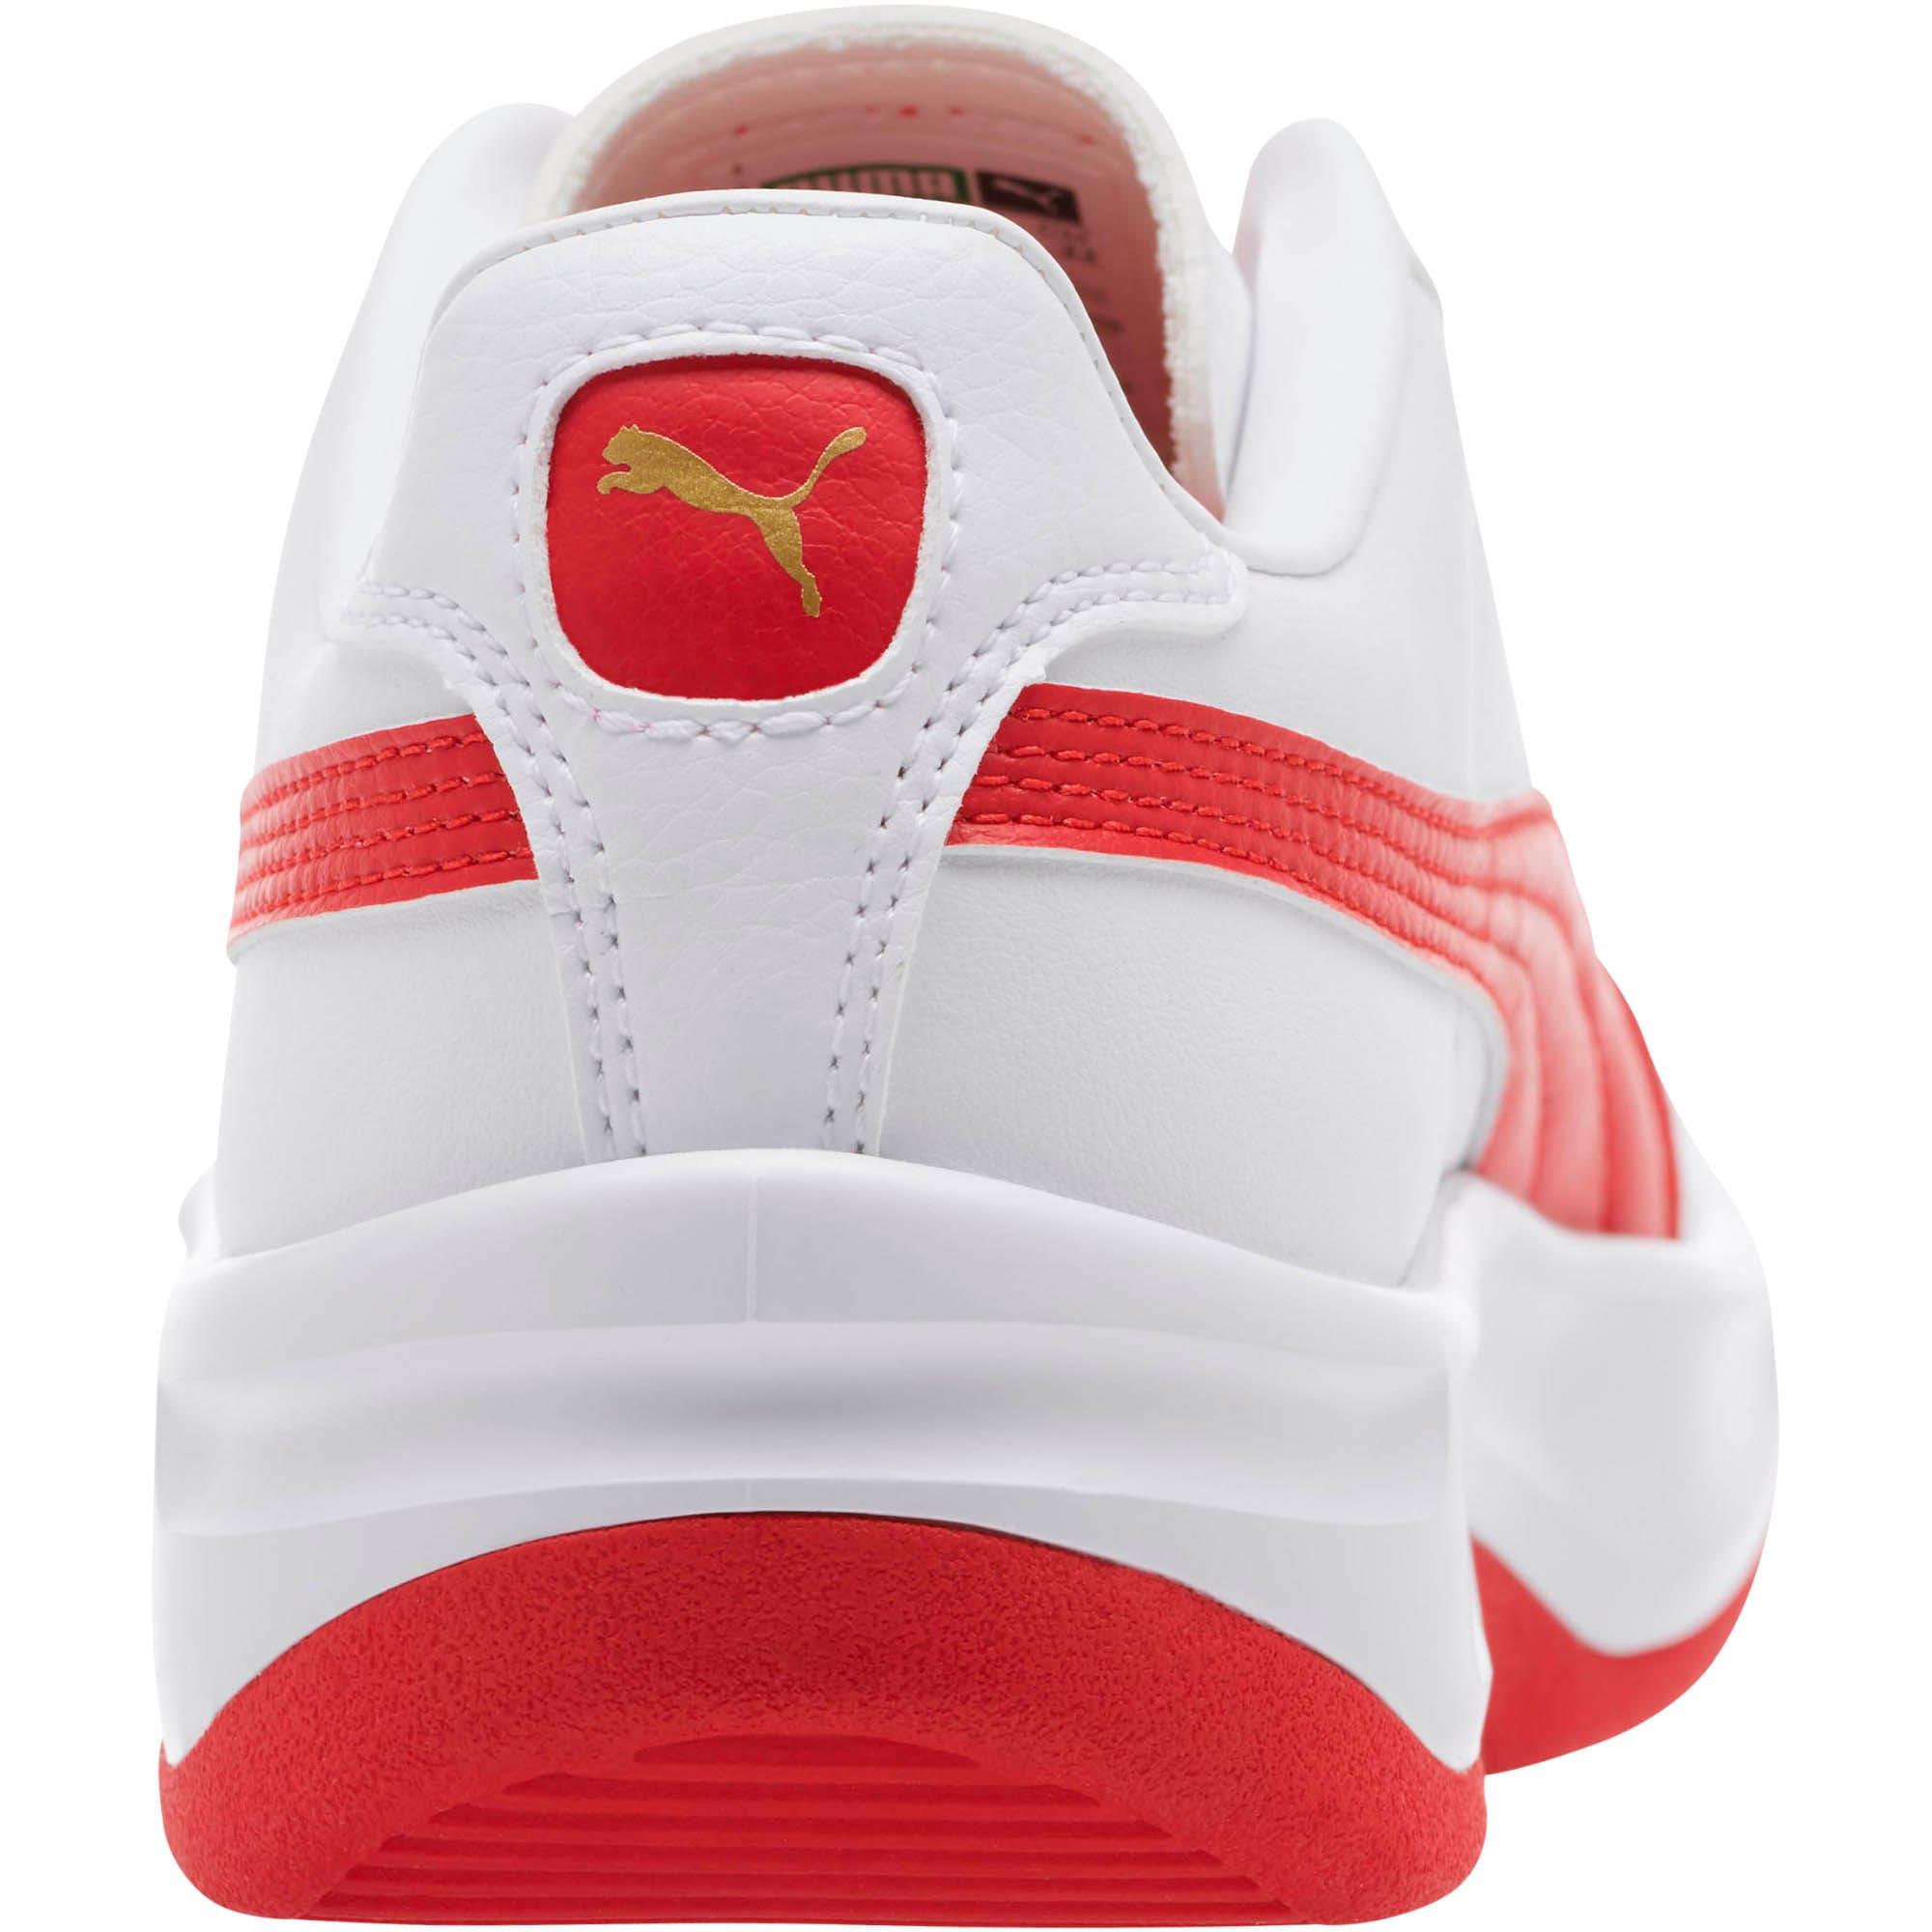 Thumbnail 4 of GV Special Sneakers JR, Puma White-Ribbon Red, medium